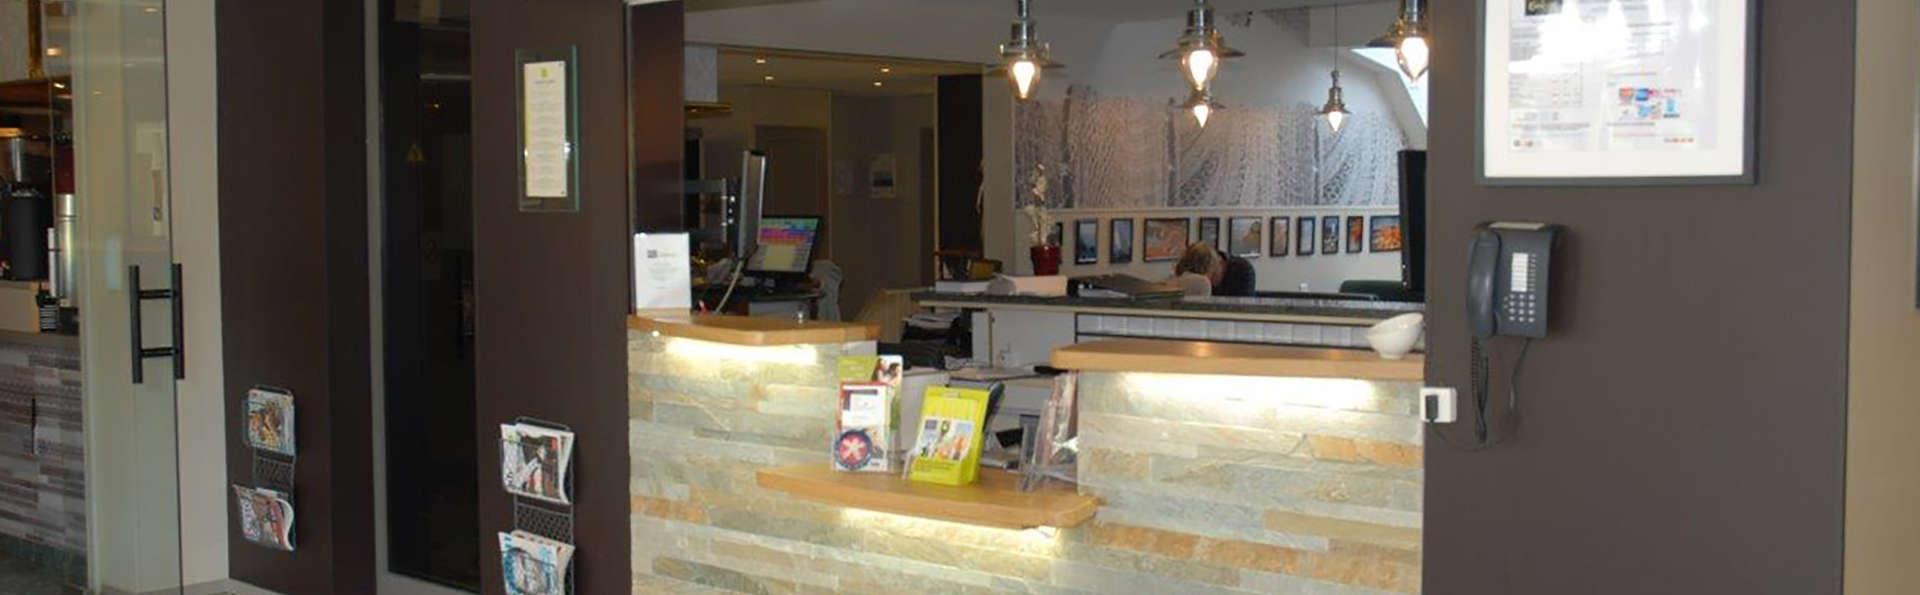 INTER-HOTEL Saint-Brieuc Nord Au Chêne Vert - Edit_Reception.jpg